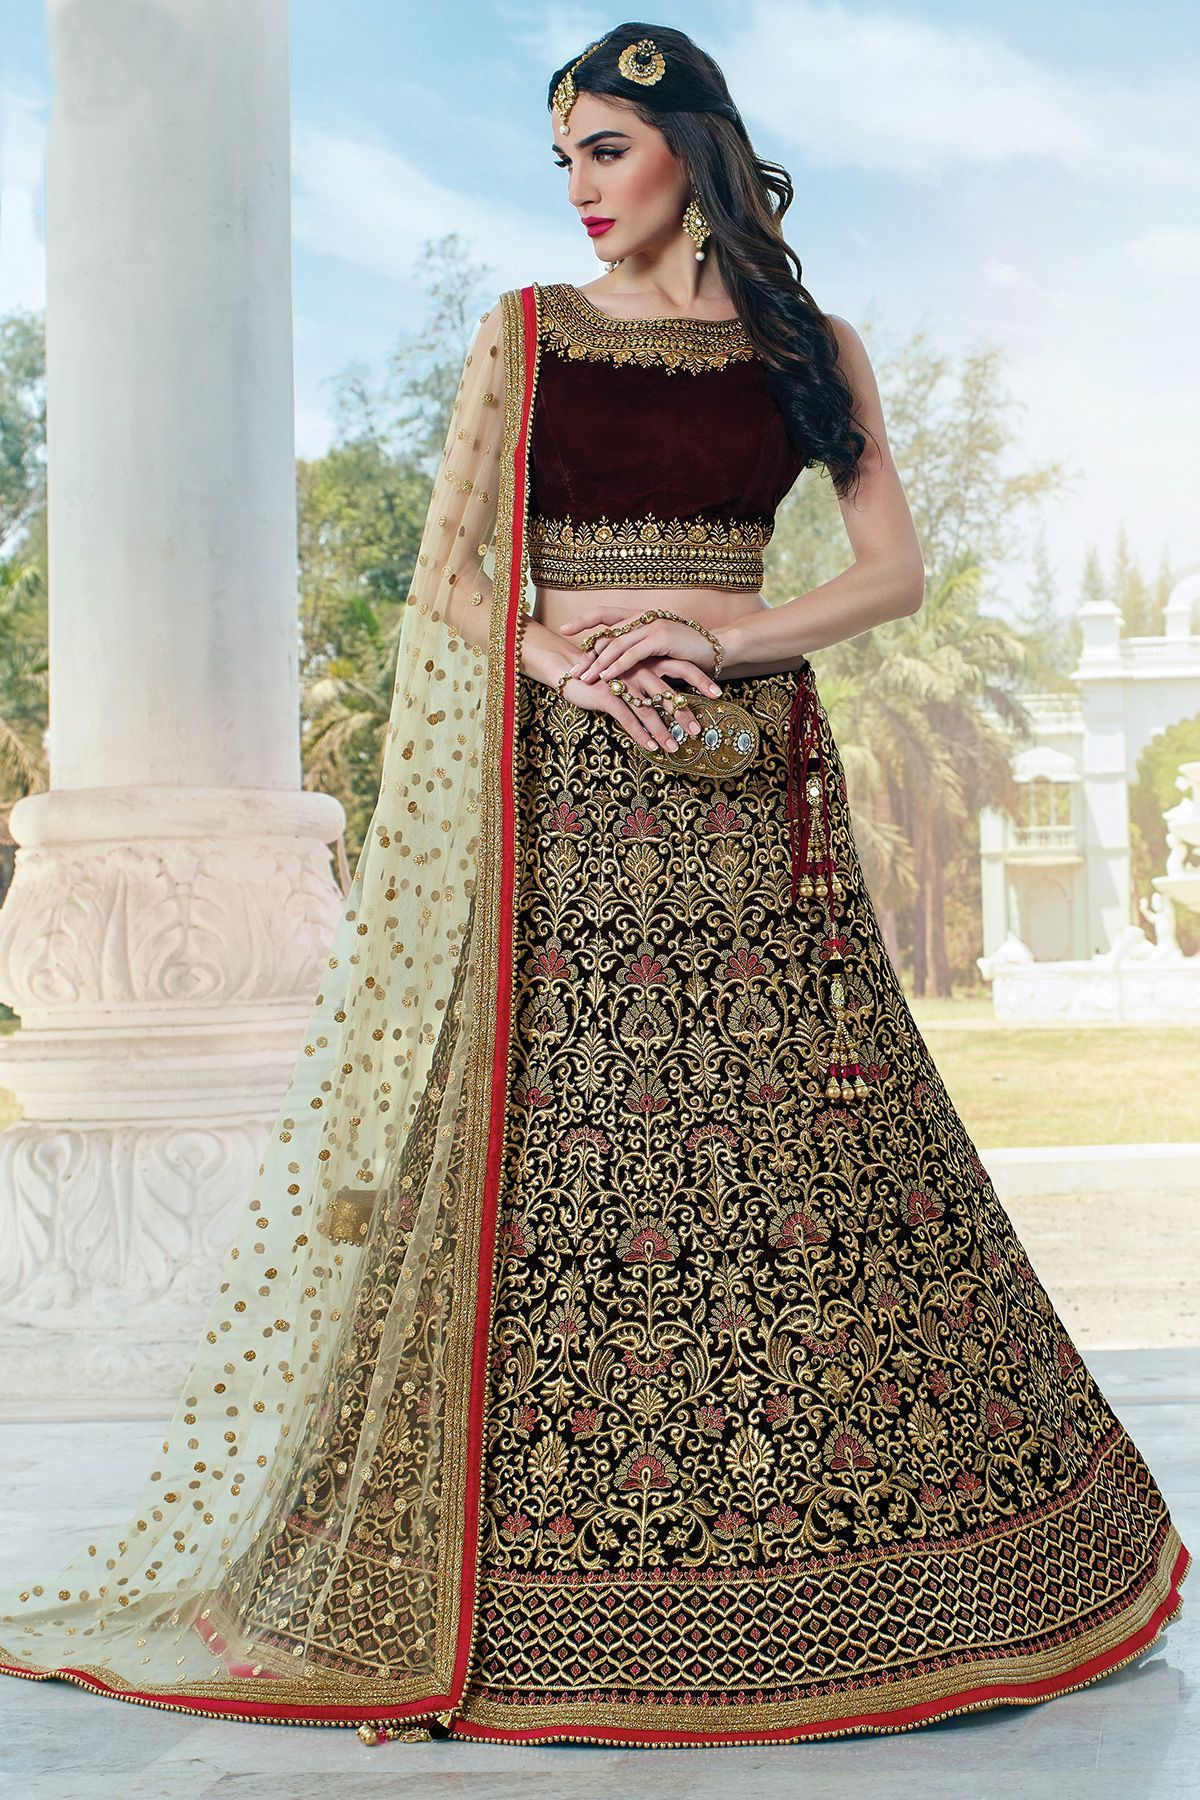 a45f529ade Brown Velvet Zari Embroidered Bridal Lehenga-GC2154 - Buy Online #lehenga  #designer #inidan #weddinglehenga #bridallehenga #velvet #zari #embroidered  ...